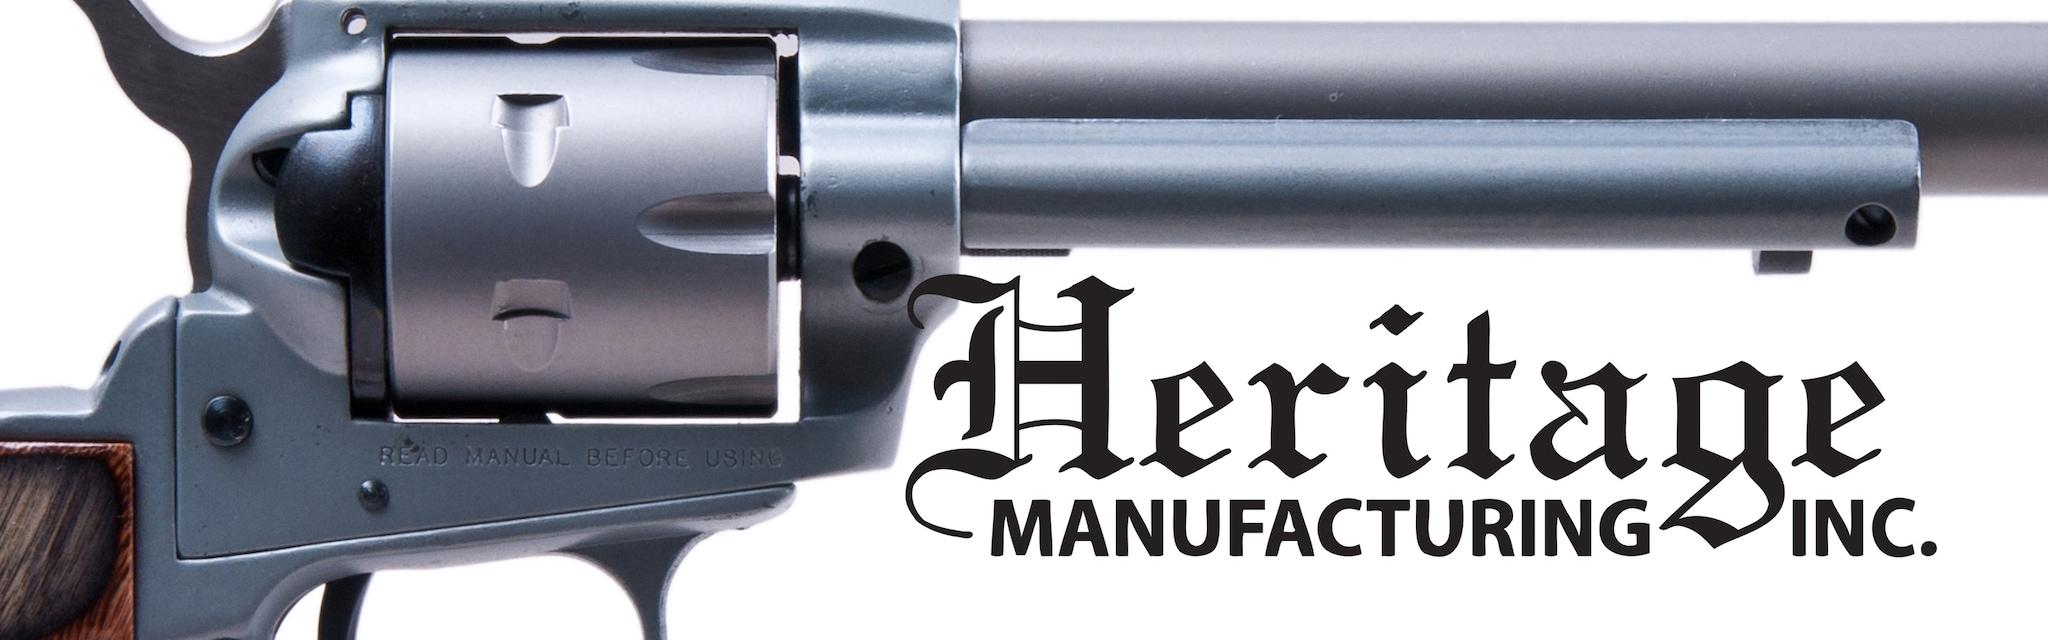 Heritage Mfg. Brand Banner